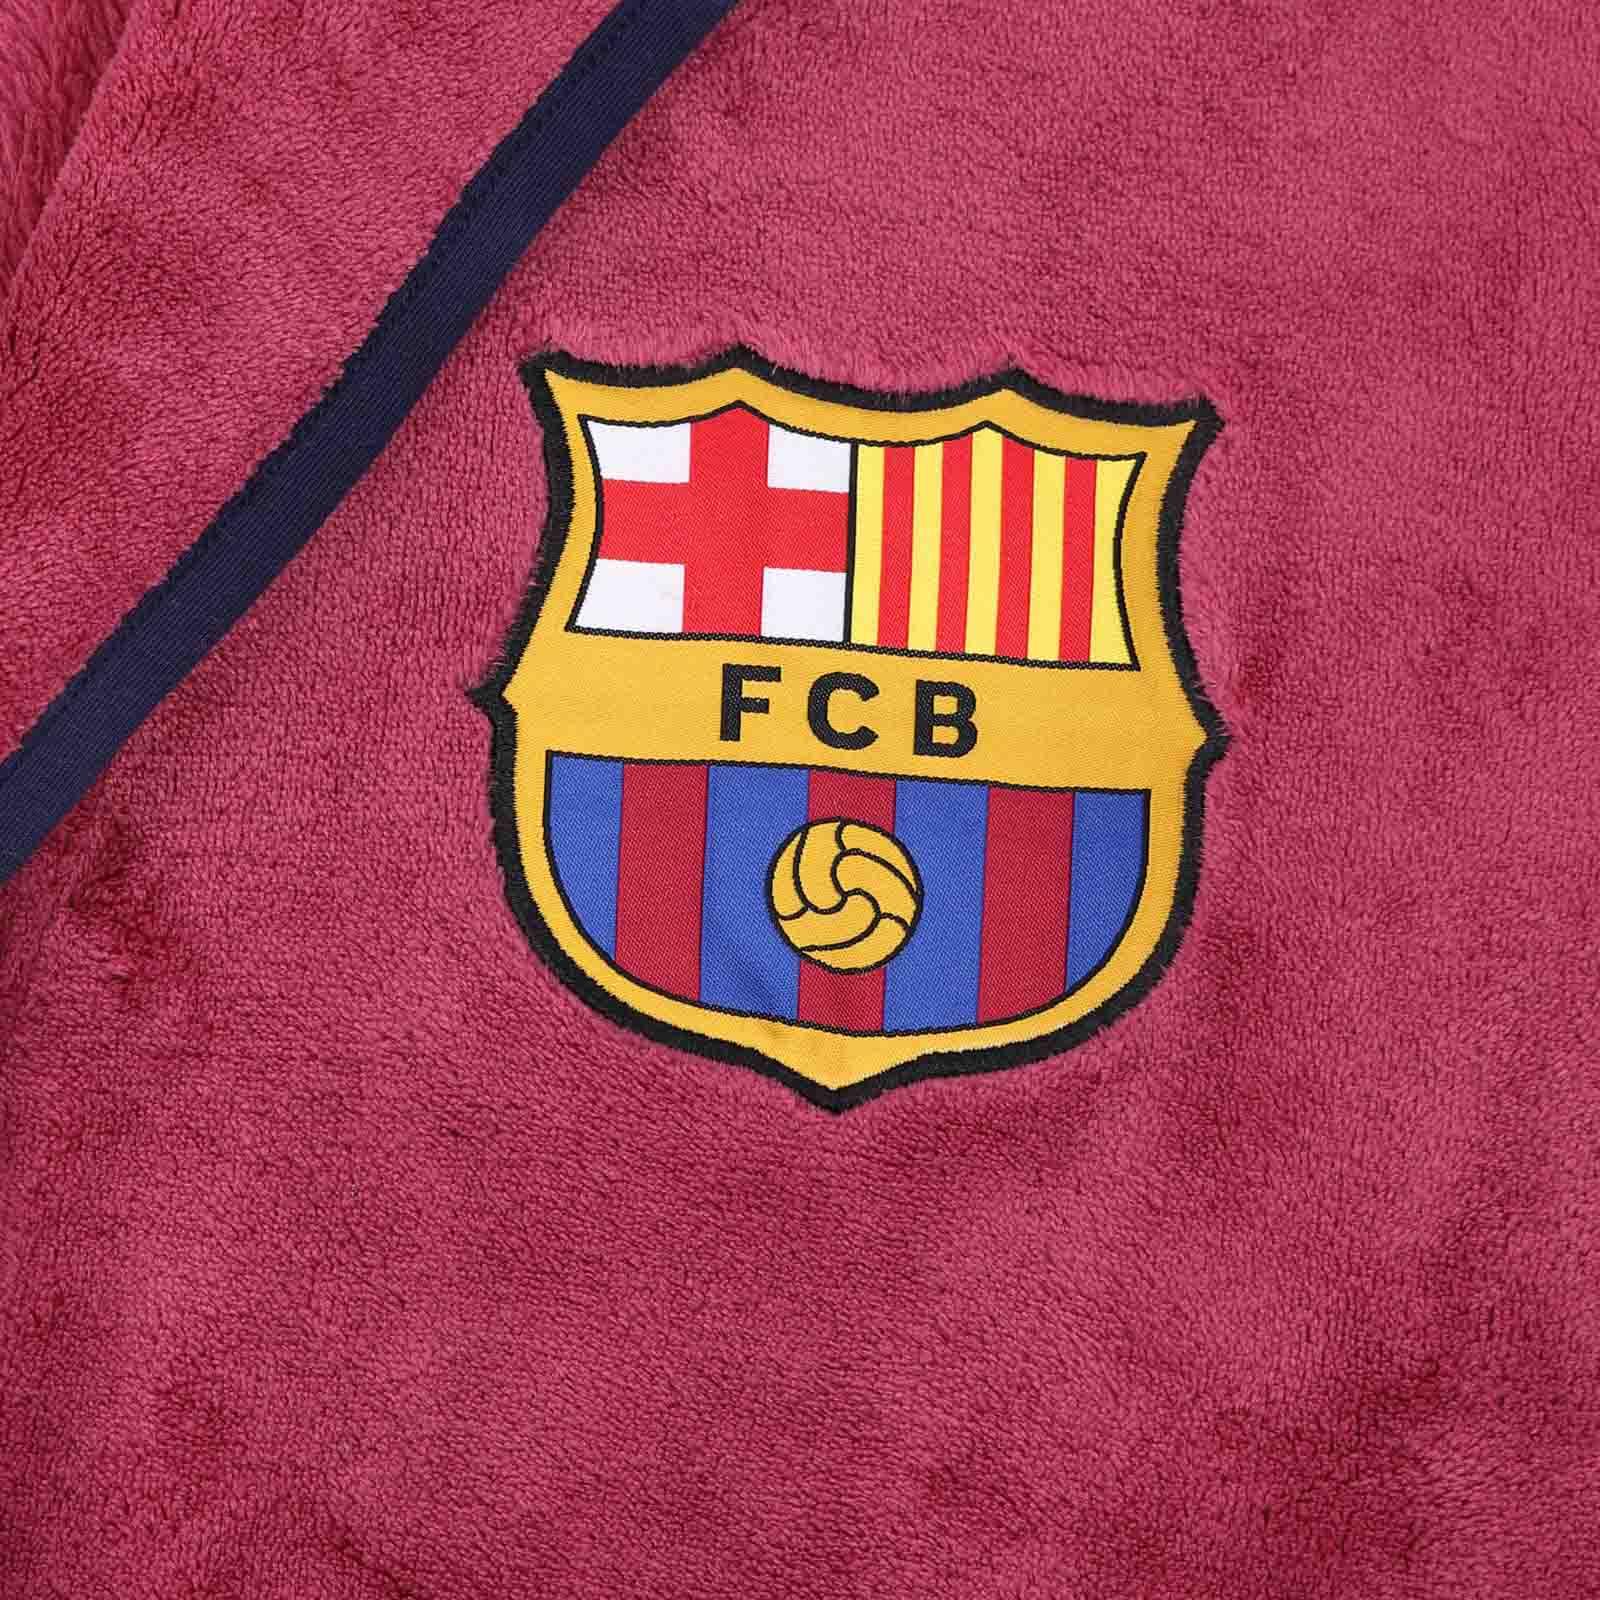 FC-Barcelona-Official-Football-Gift-Boys-Hooded-Fleece-Dressing-Gown-Robe miniatuur 11